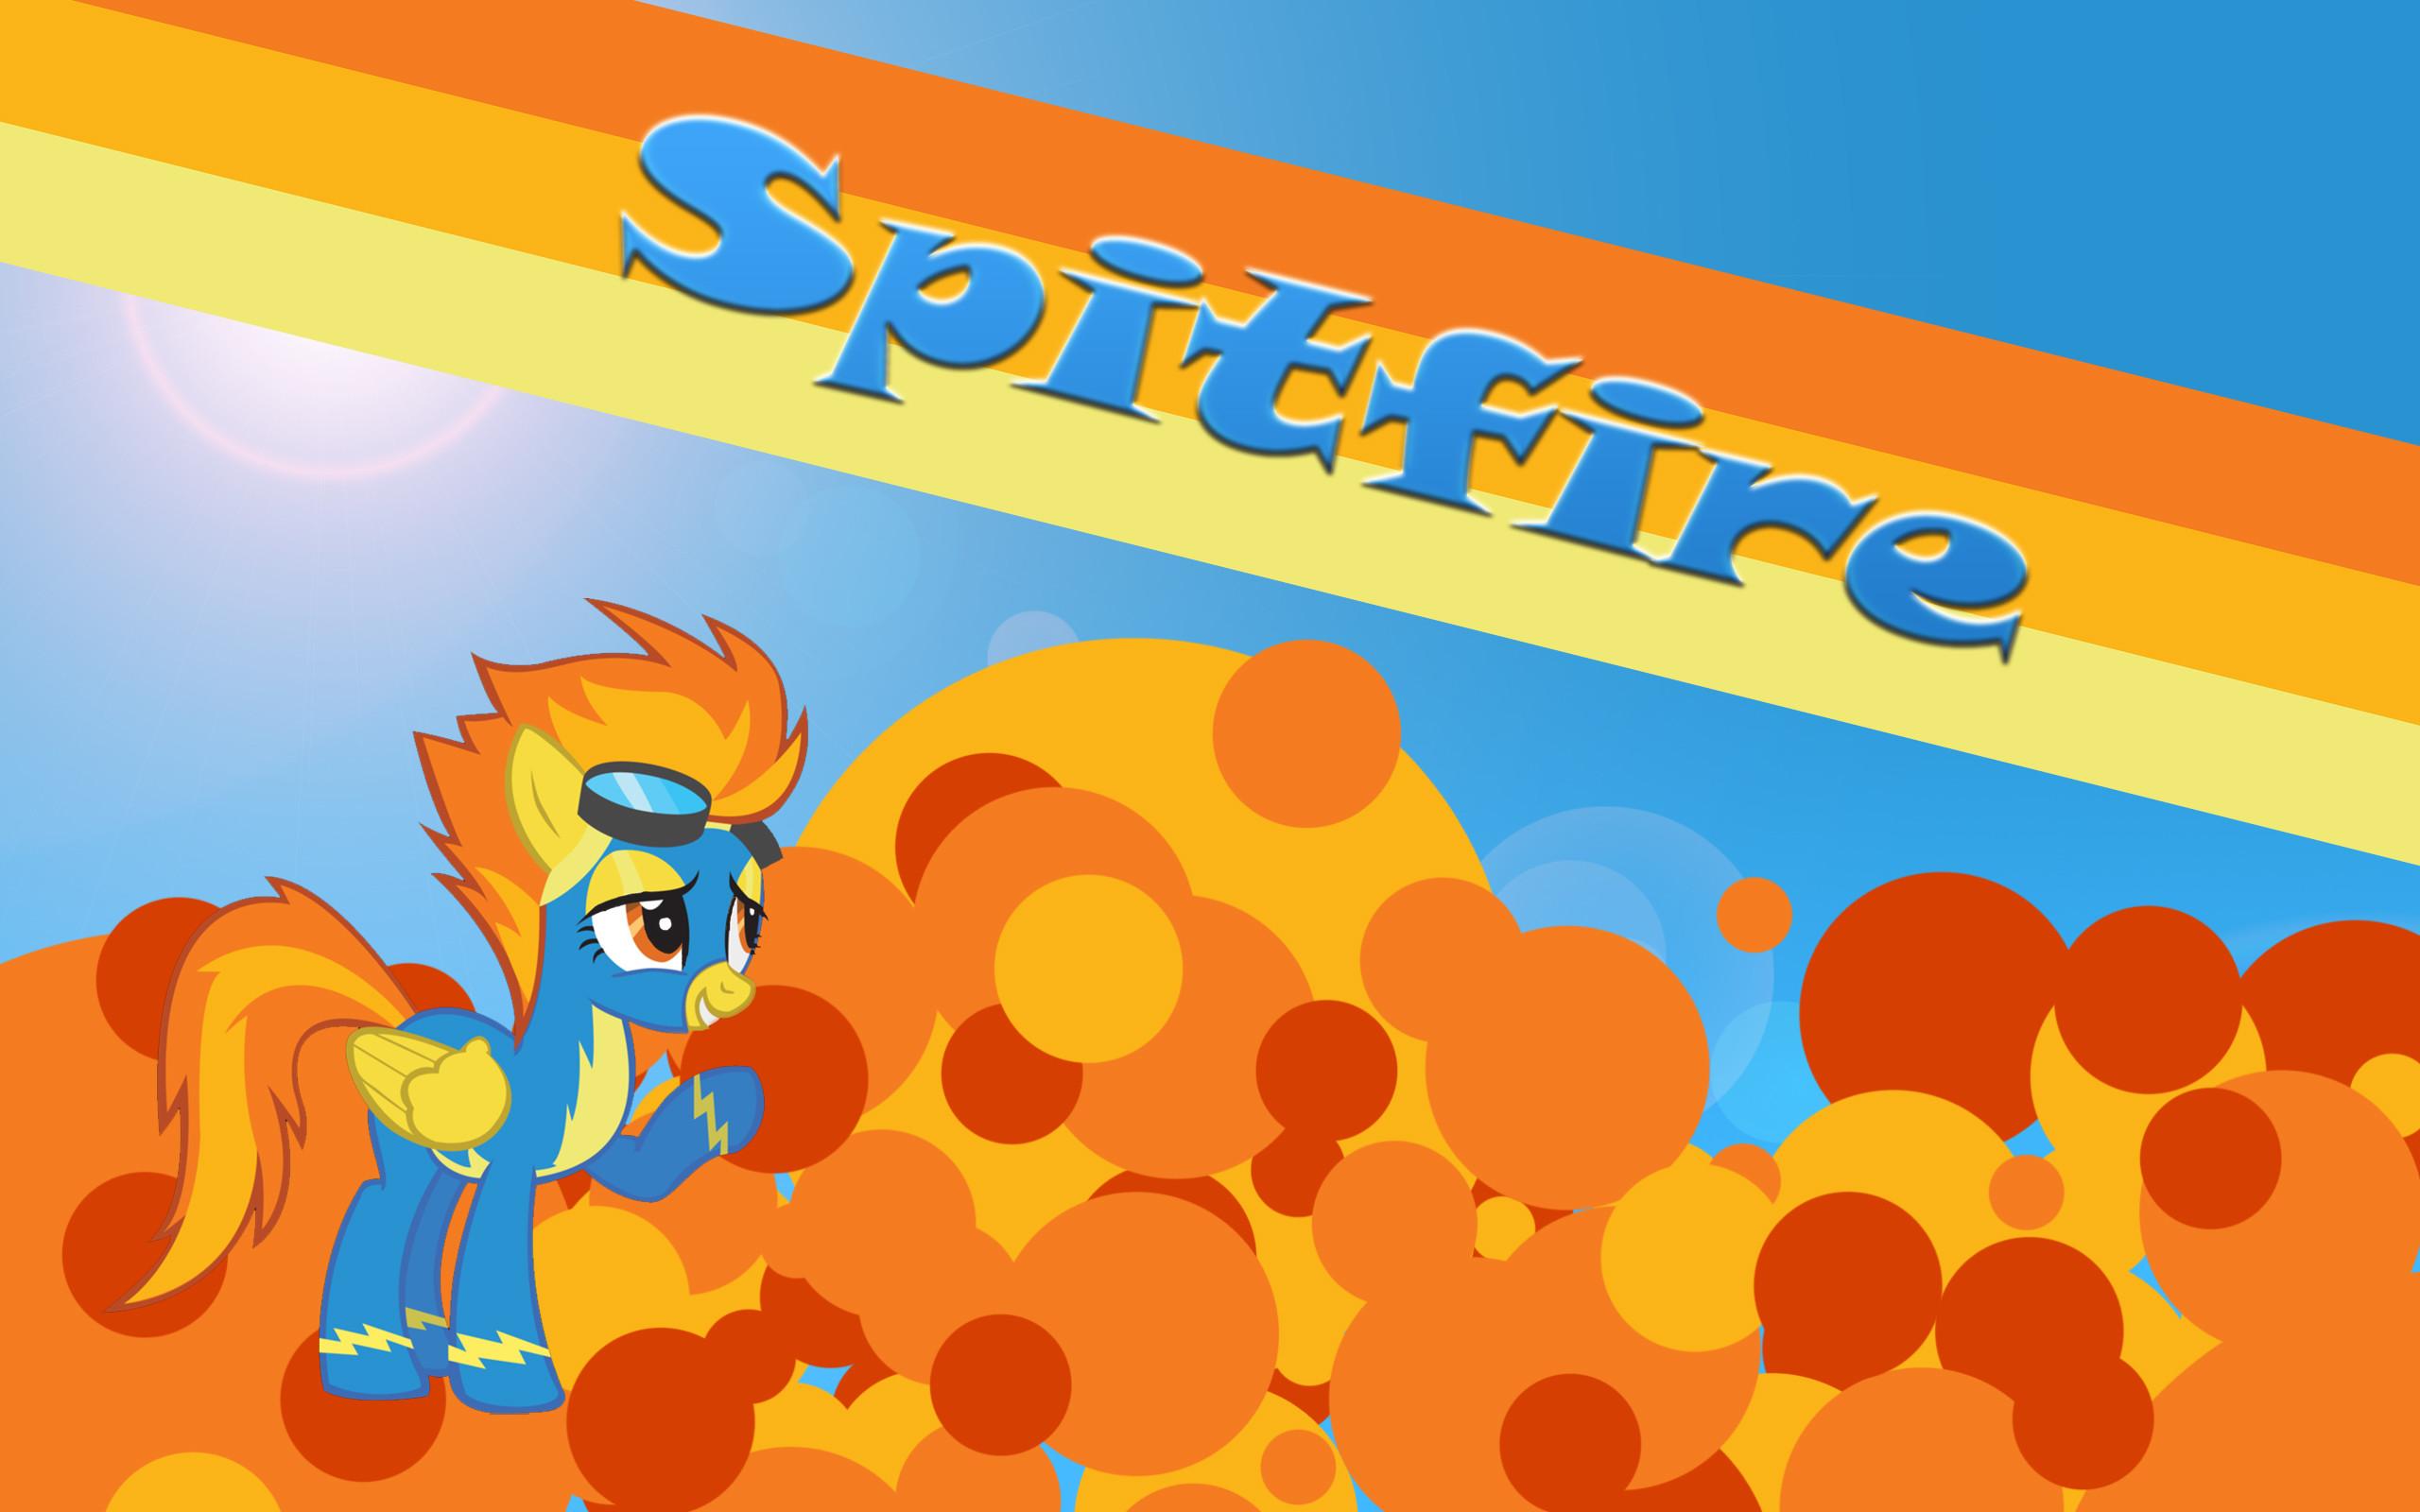 Res: 2560x1600, Spitfire Logo Wallpaper images